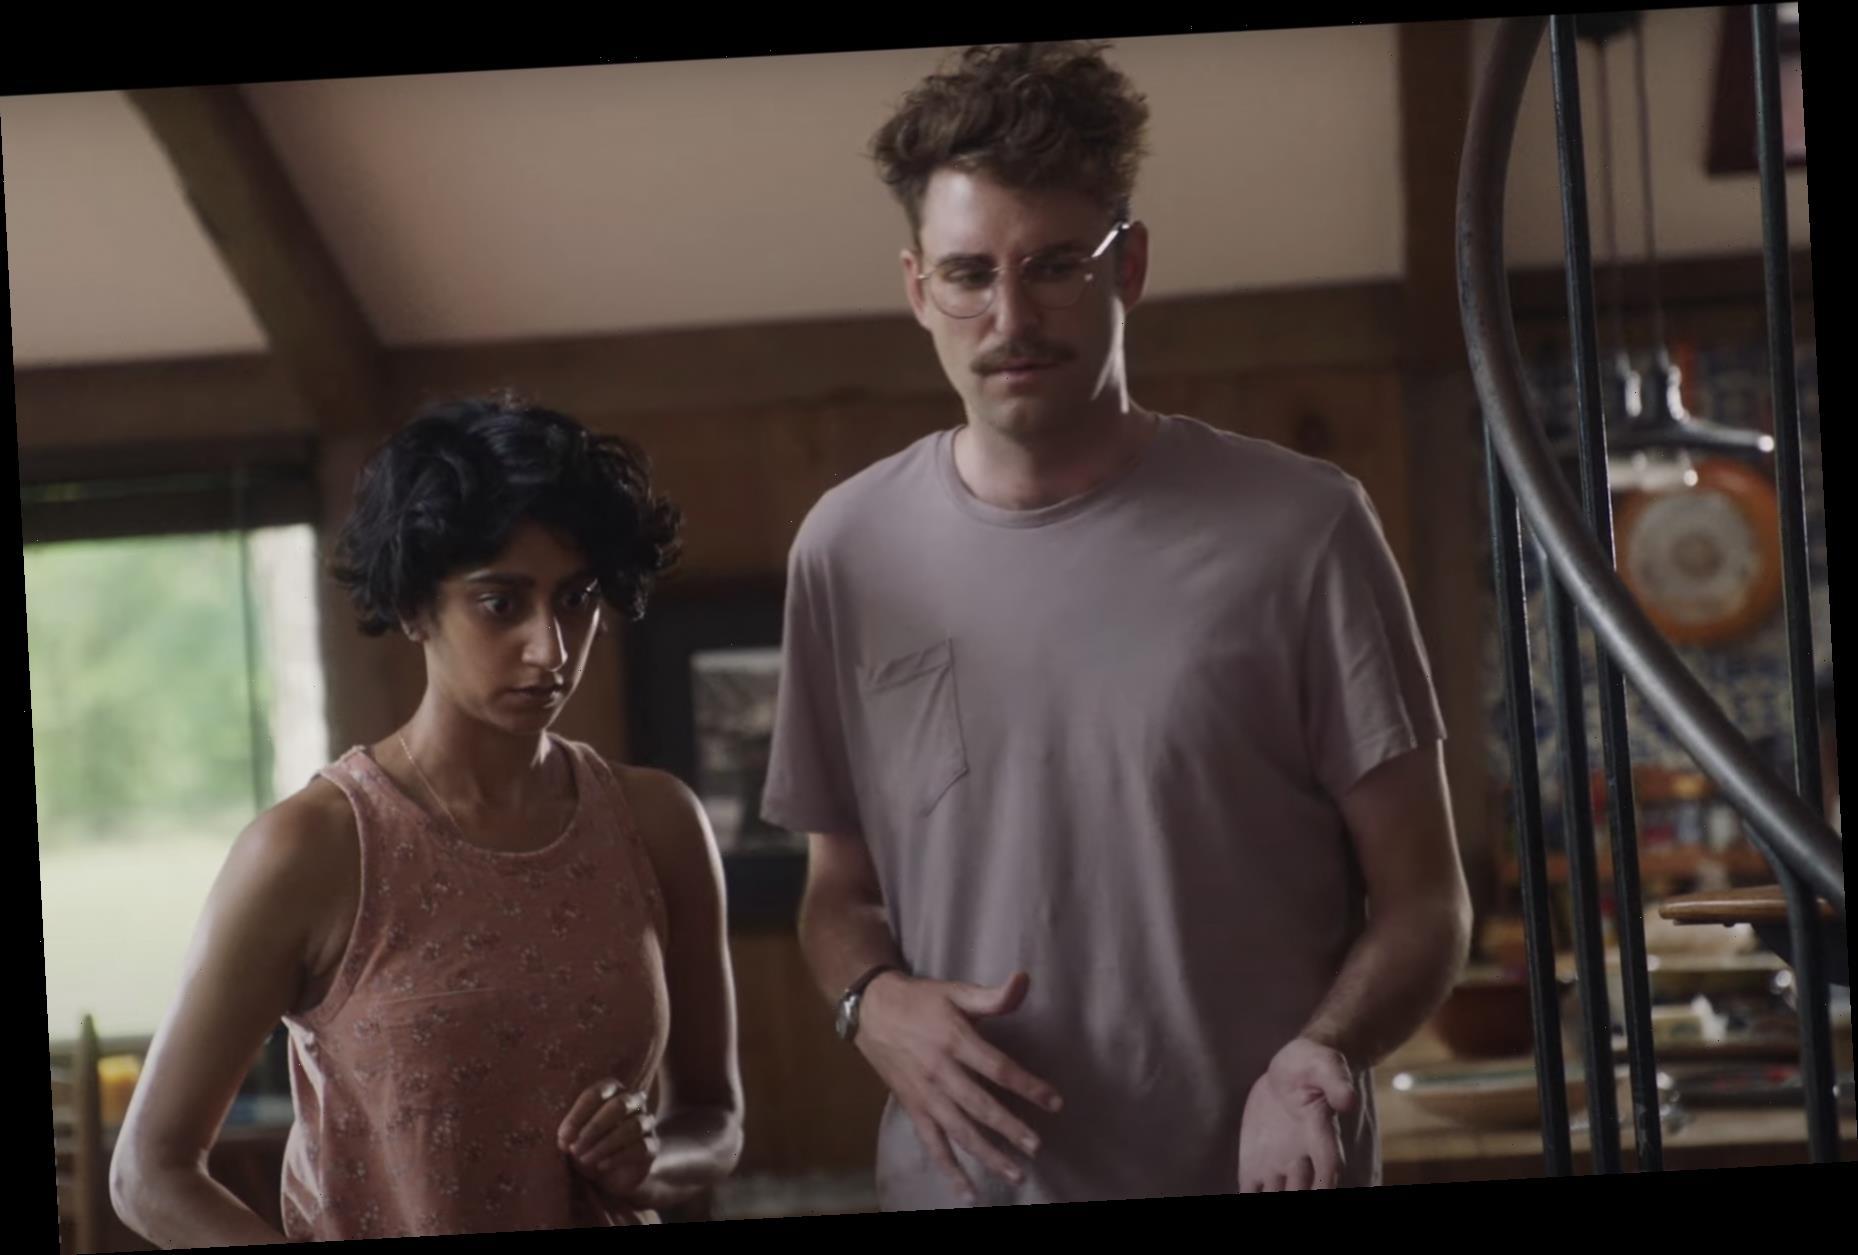 'Save Yourselves!' Trailer: Pouffes Threaten John Reynolds, Sunita Mani in Comedy Sci-Fi Film